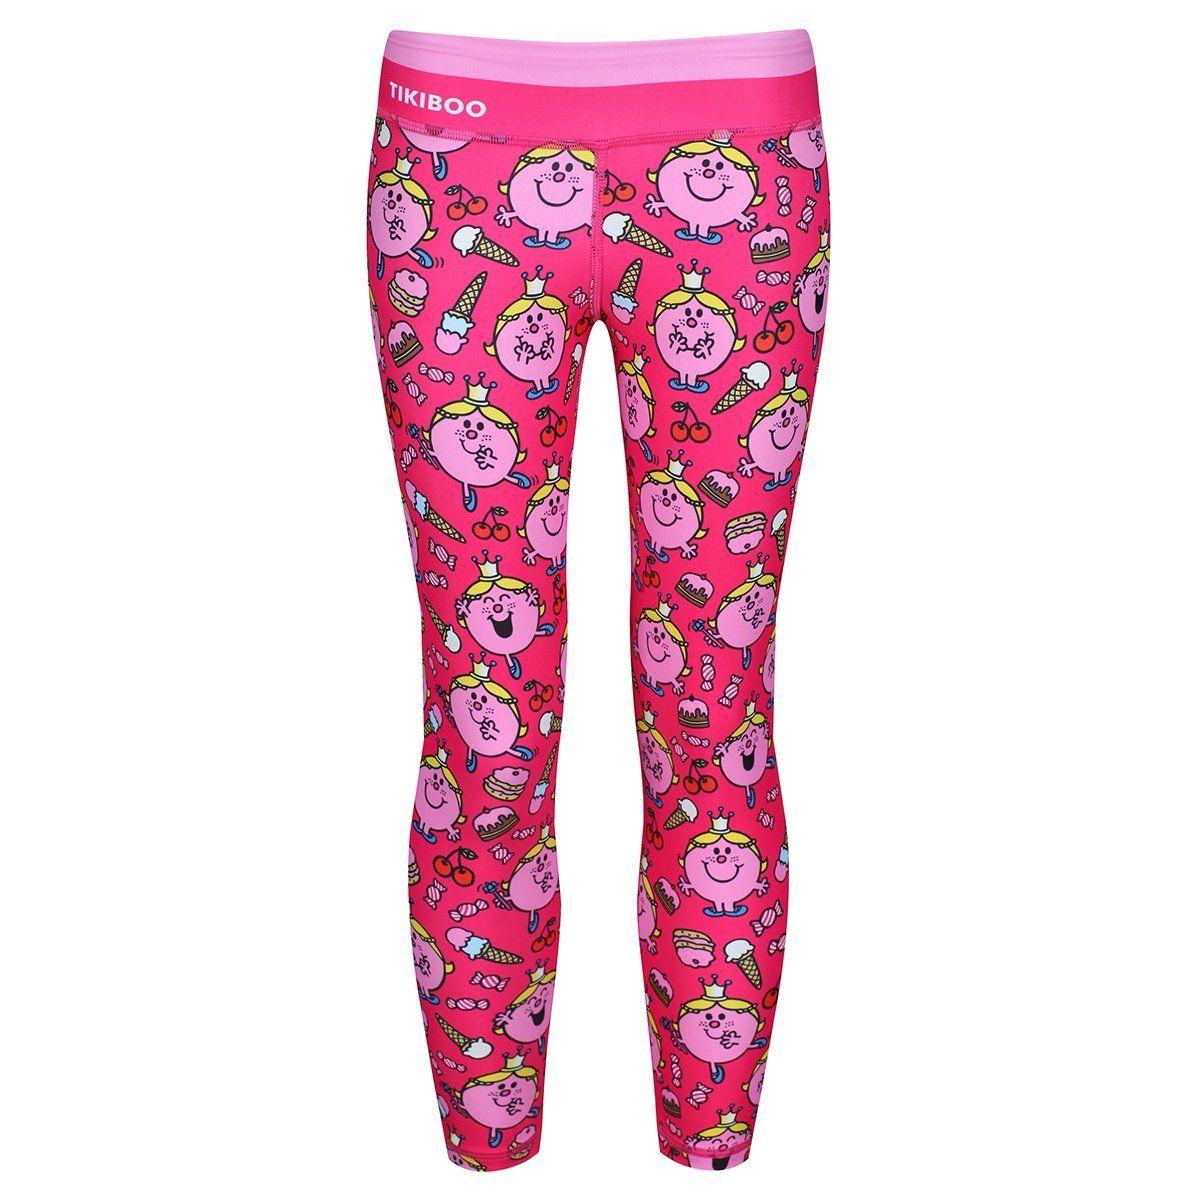 d882dde3bc58c Little Miss Princess Kids Pink Leggings in 2019   Tikiboo x Mr Men ...